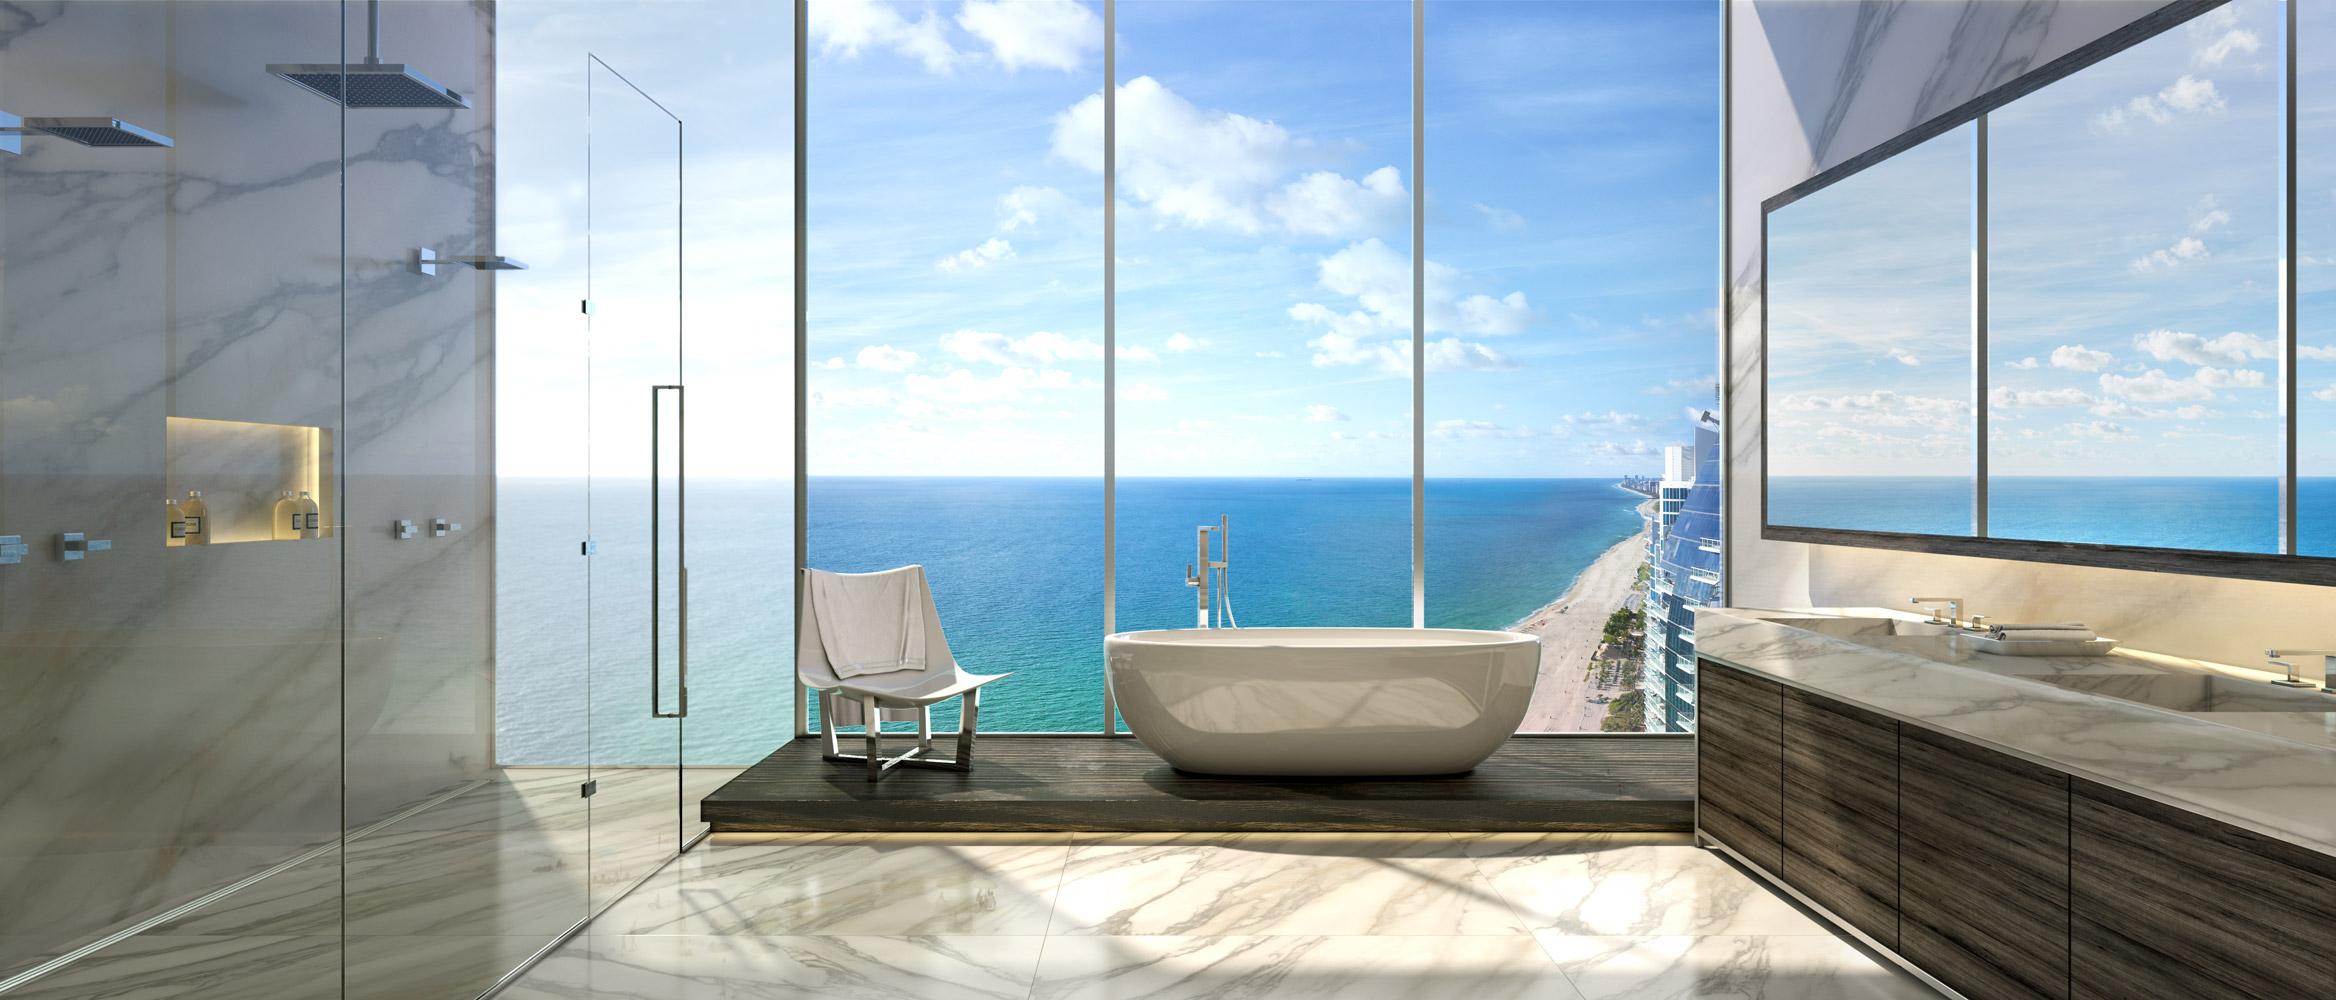 Muse Condos Sunny Isles BeachNew Build Homes